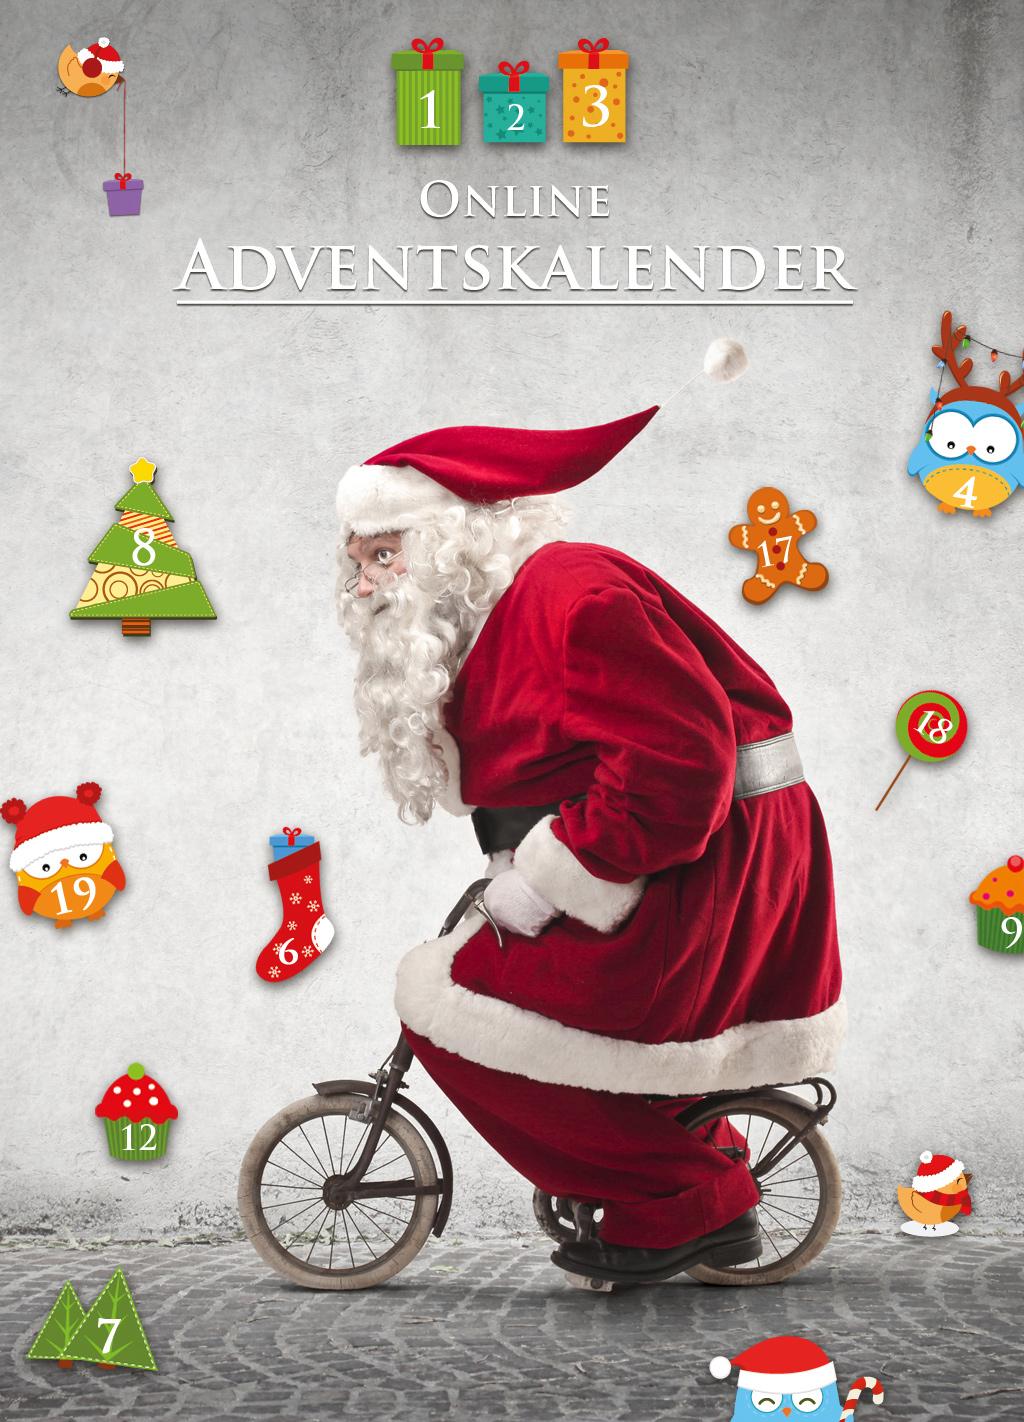 Facebook_Adventskalender_App